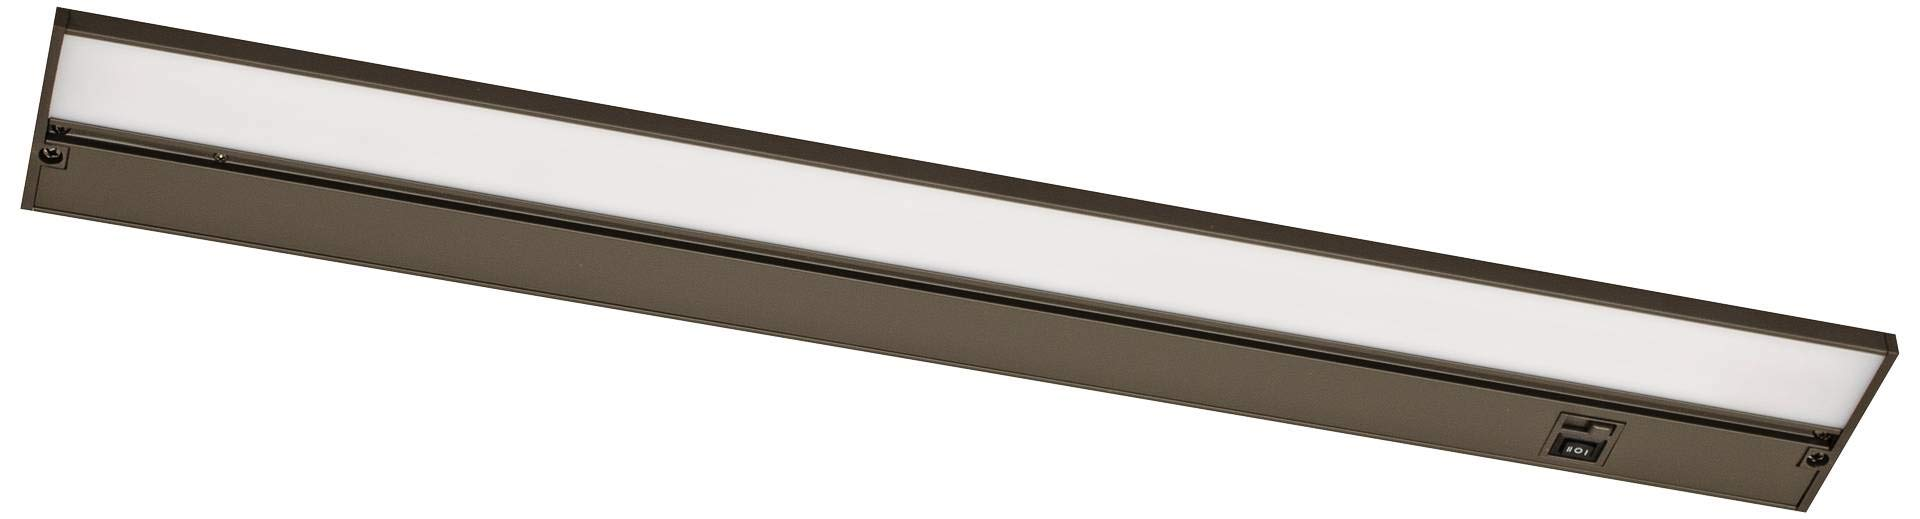 Koren 22'' Wide Oil-Rubbed Bronze LED Under Cabinet Light